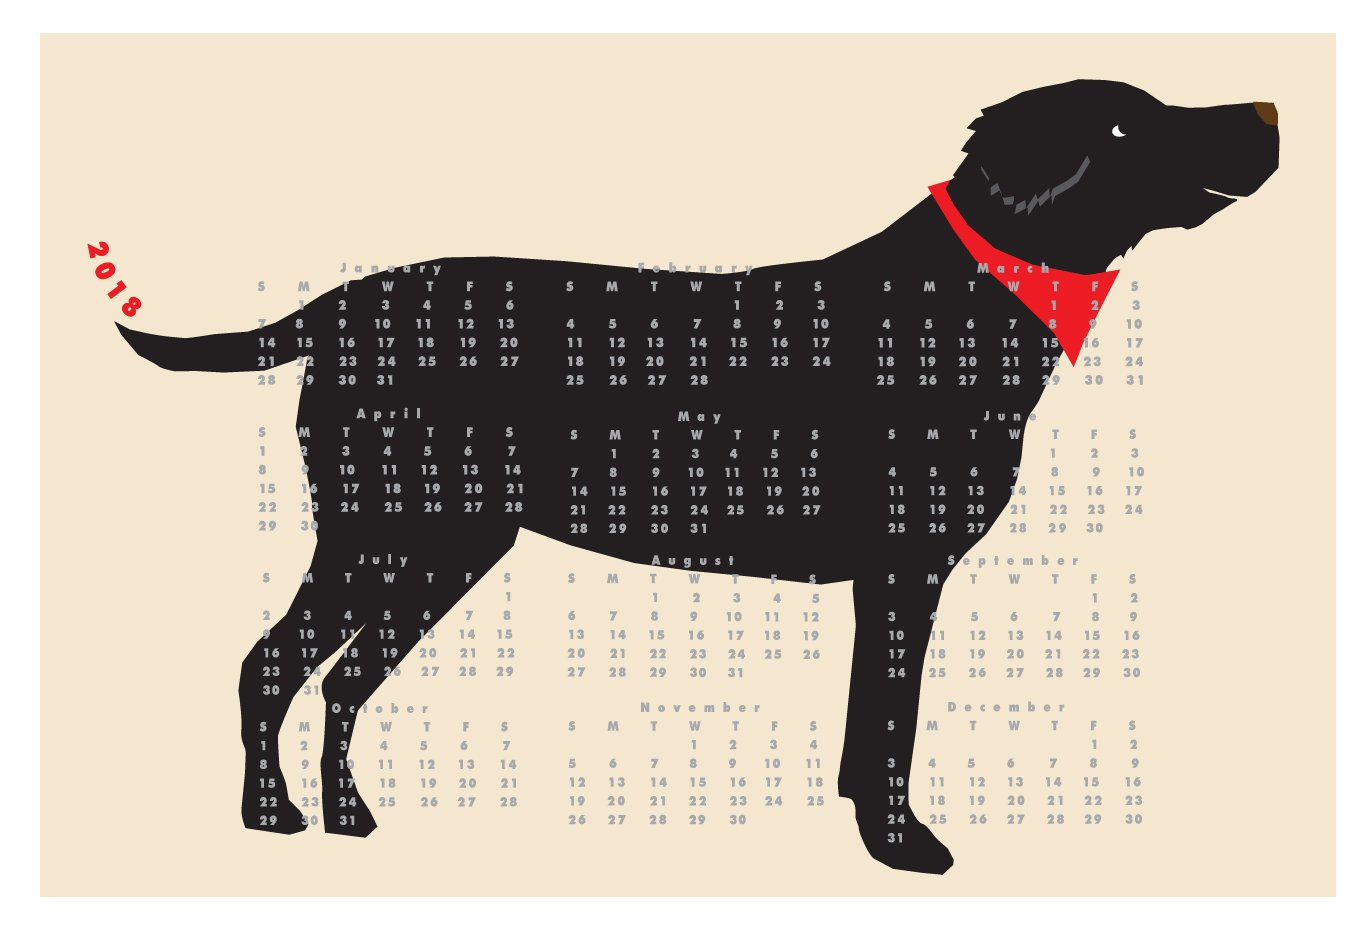 2018 Black Lab Dog Calendar wall calendar poster 13 x 19 inches